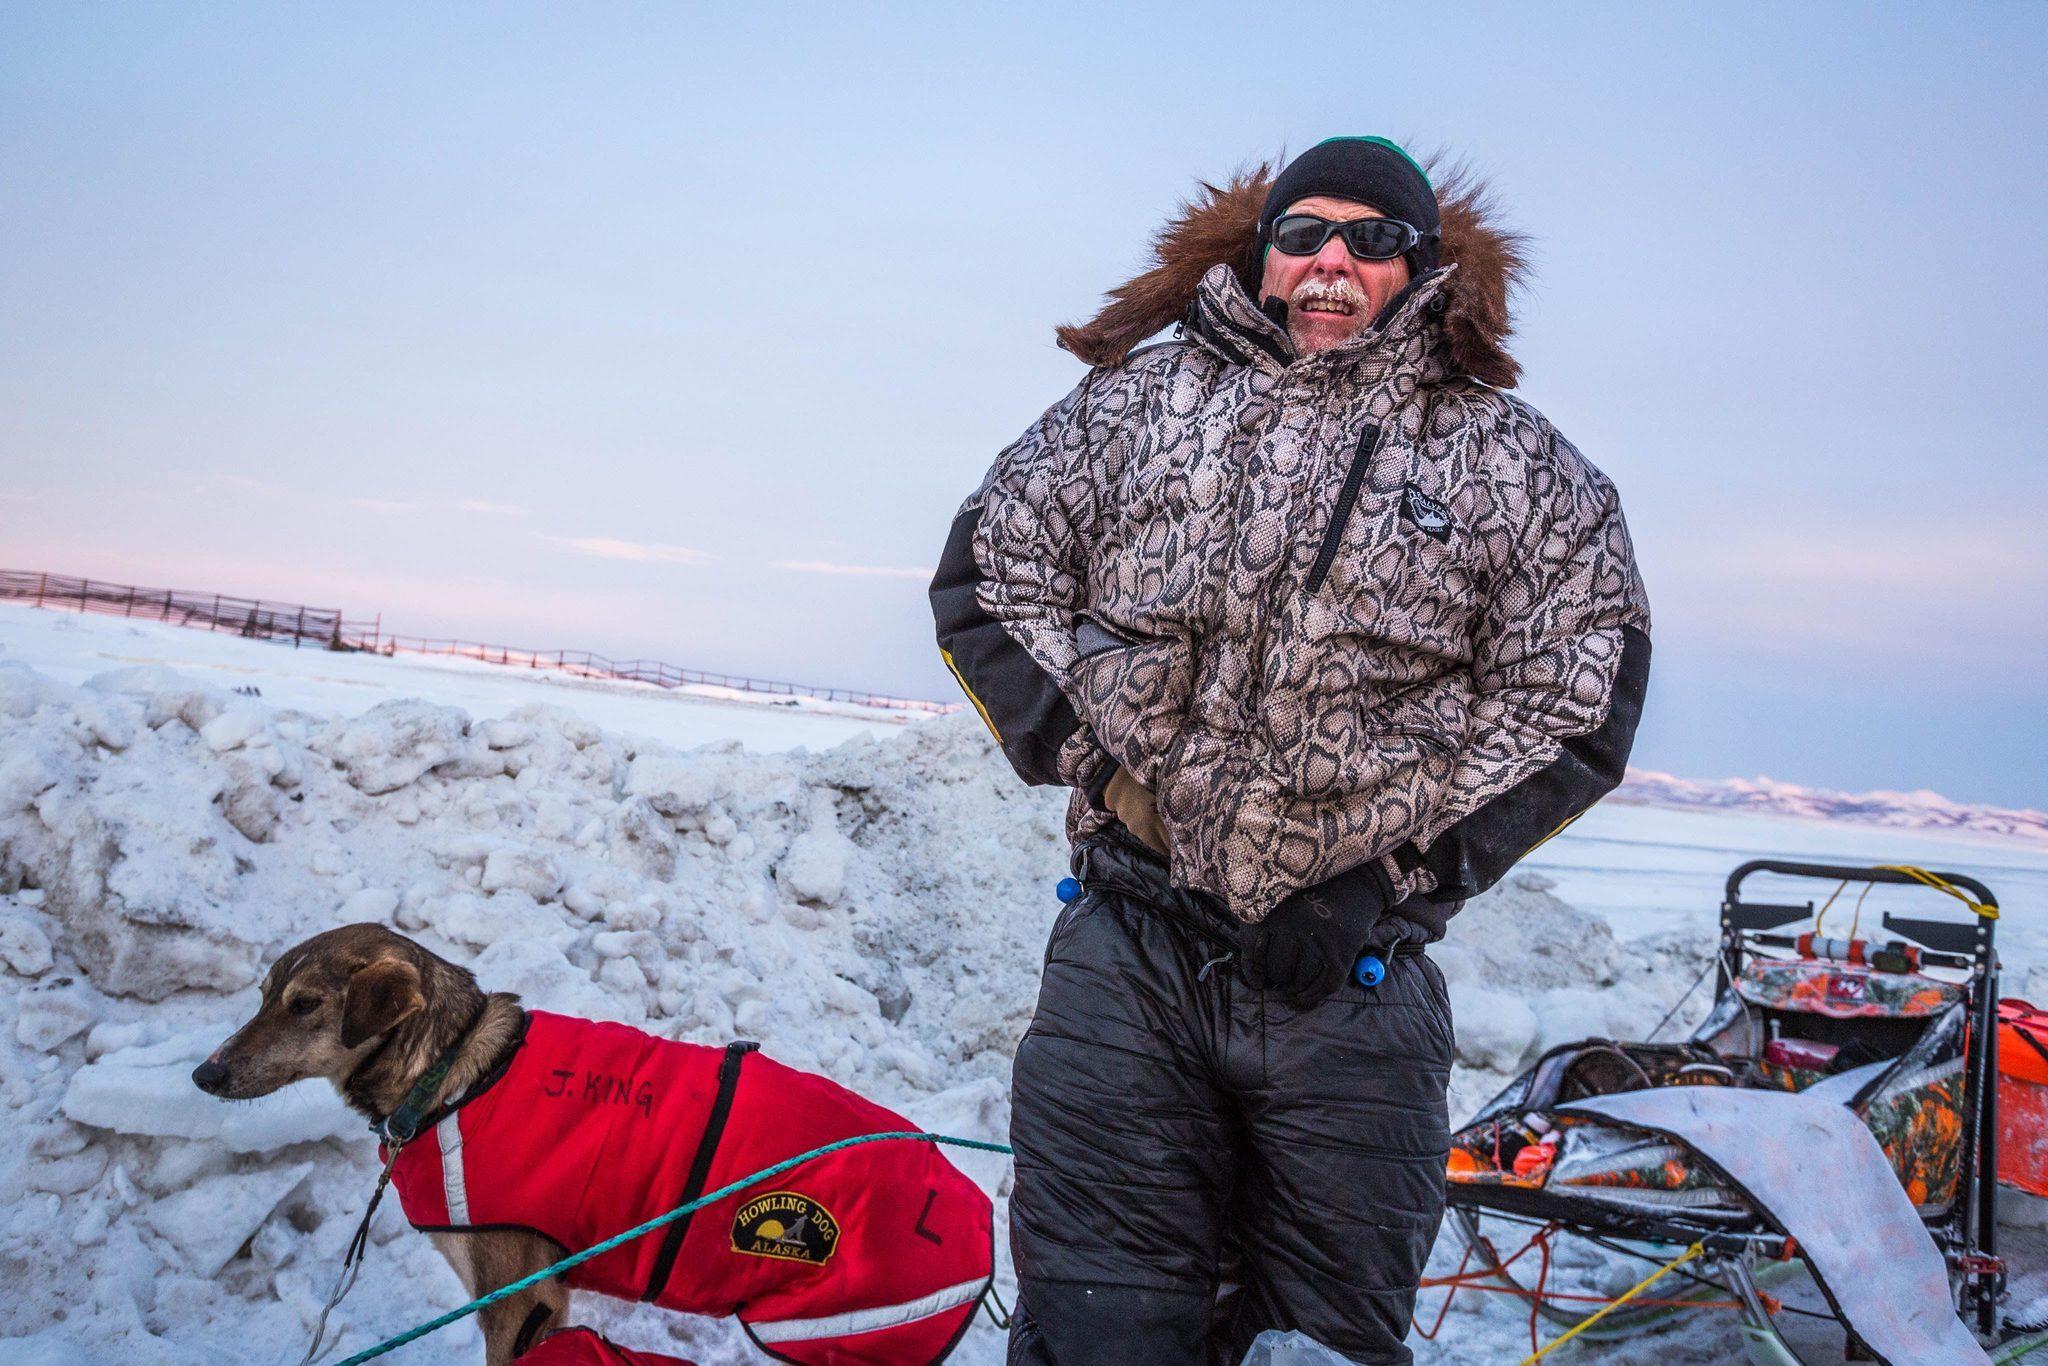 Snowmobile Slams Into Iditarod Teams, Killing One Dog And Injuring Others   La Times